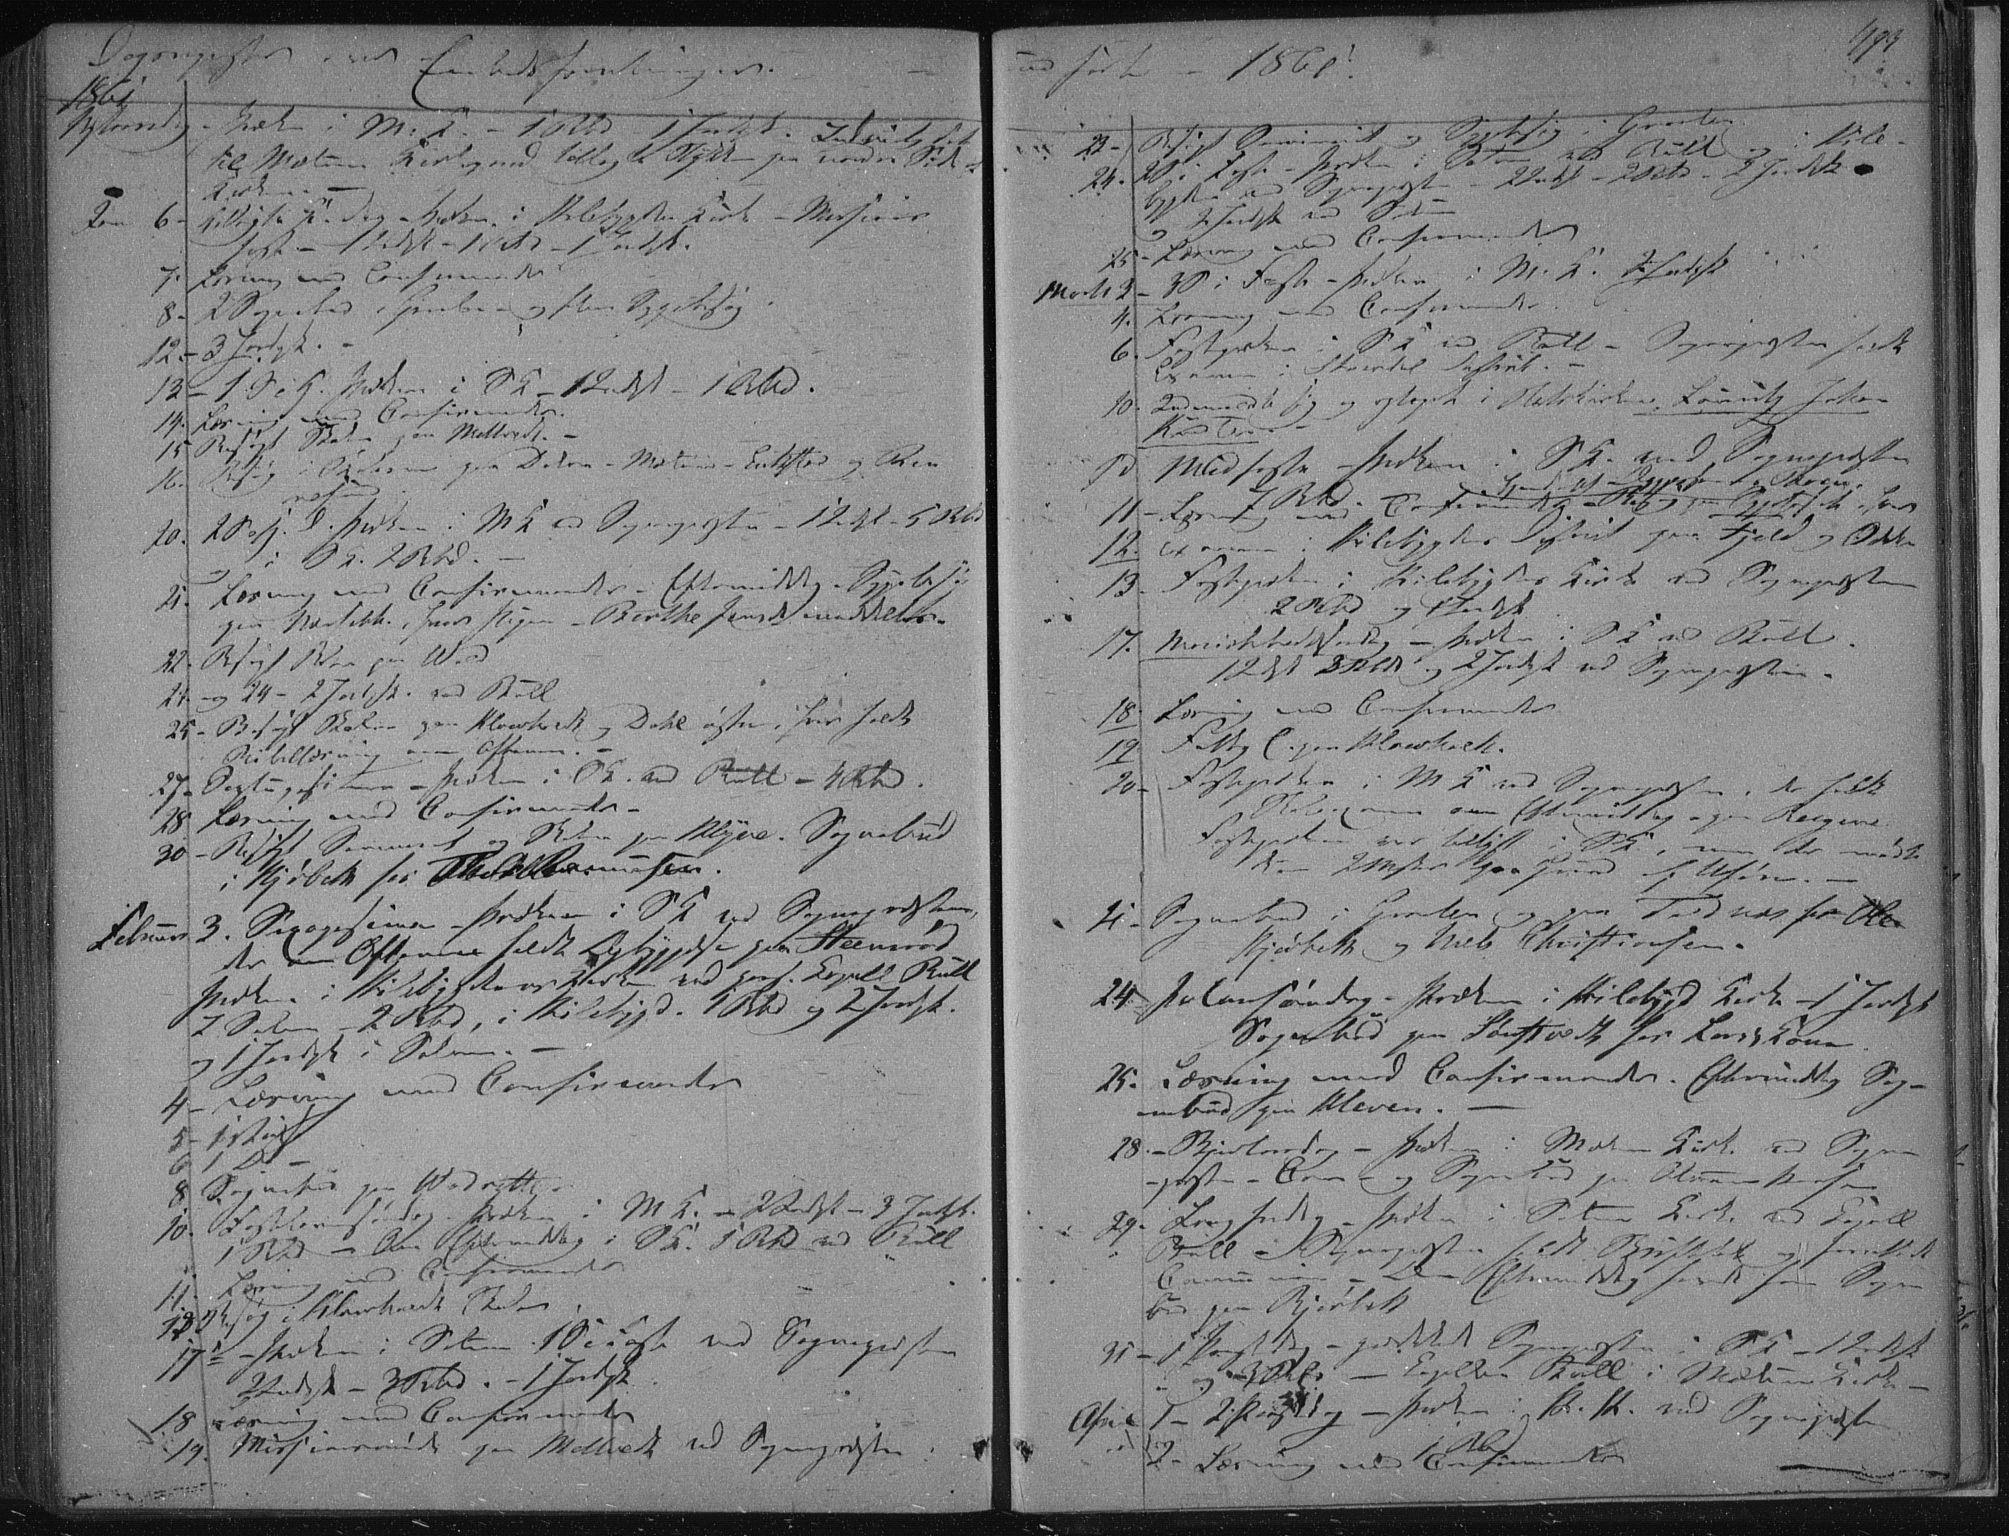 SAKO, Solum kirkebøker, F/Fa/L0007: Ministerialbok nr. I 7, 1856-1864, s. 493